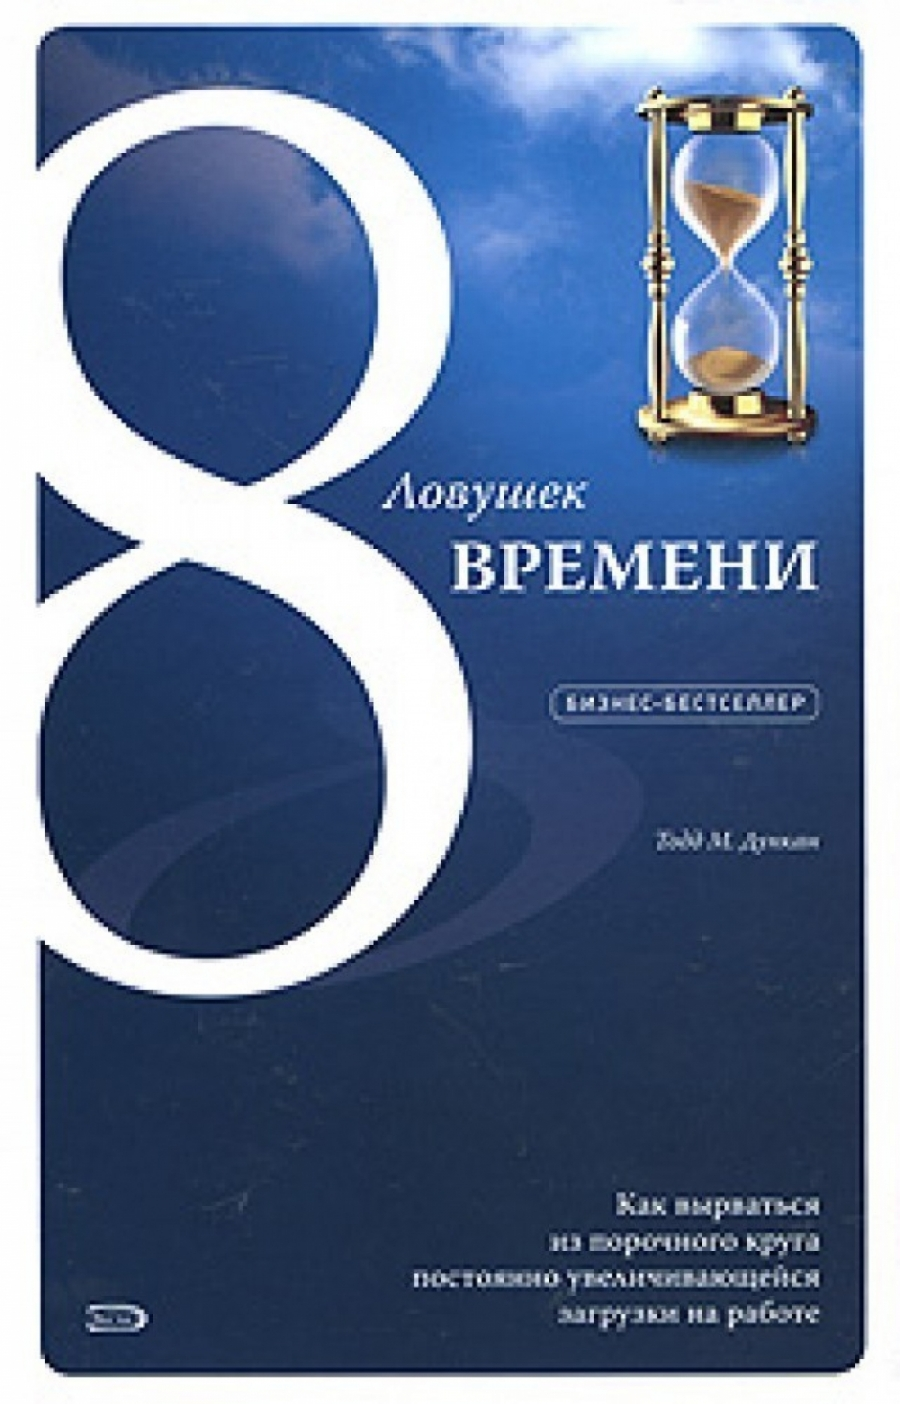 Обложка книги:  дункан т. м - 8 ловушек времени